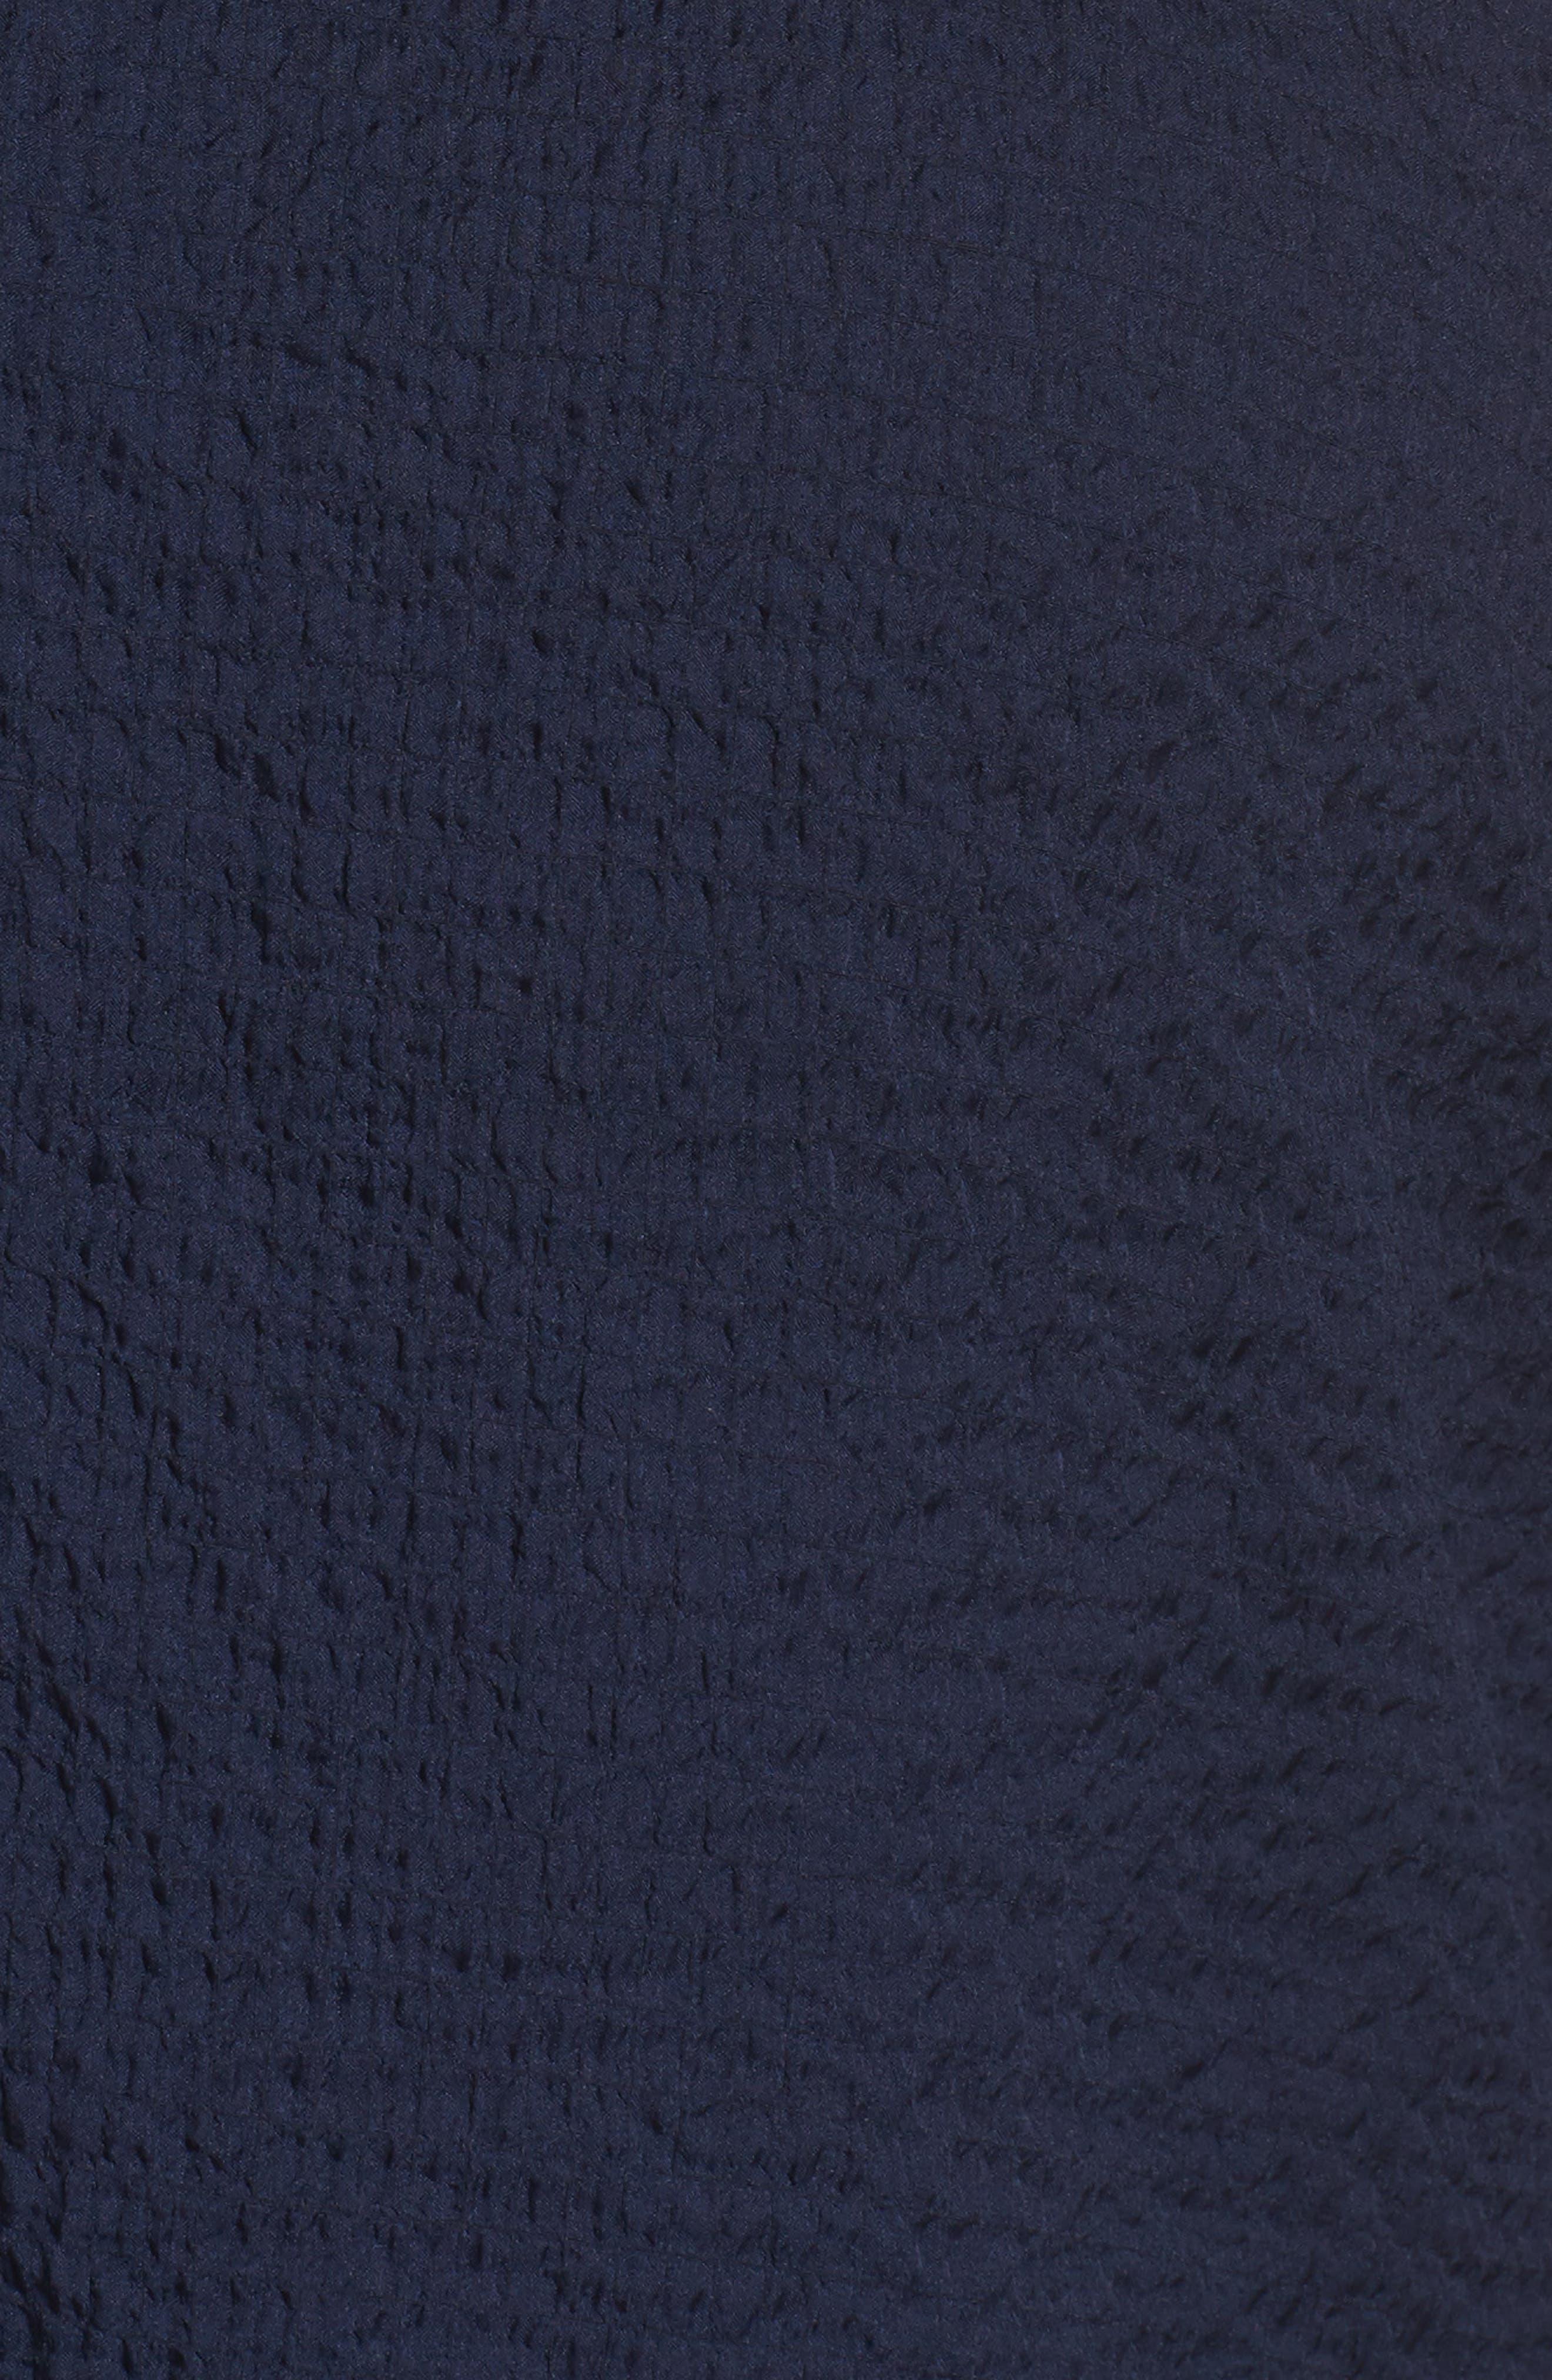 Sheer Batwing Blouse,                             Alternate thumbnail 5, color,                             Navy Peacoat